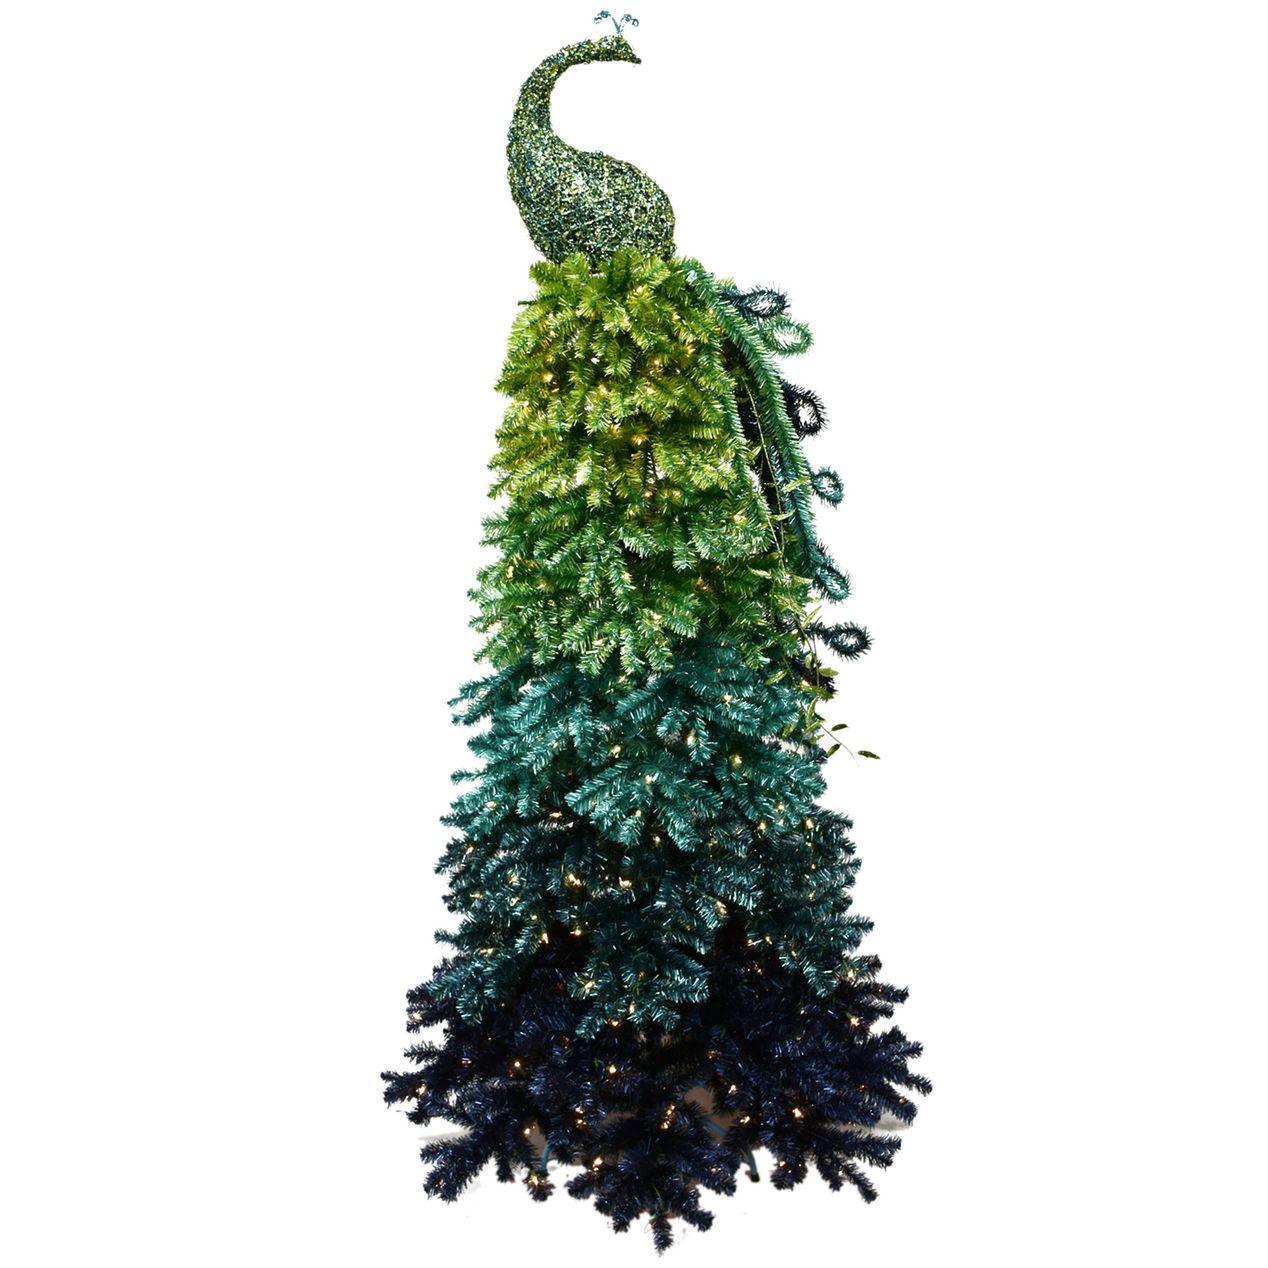 D13 7-ft Pre-Lit Peacock Christmas Tree | Holidays | Pinterest ...